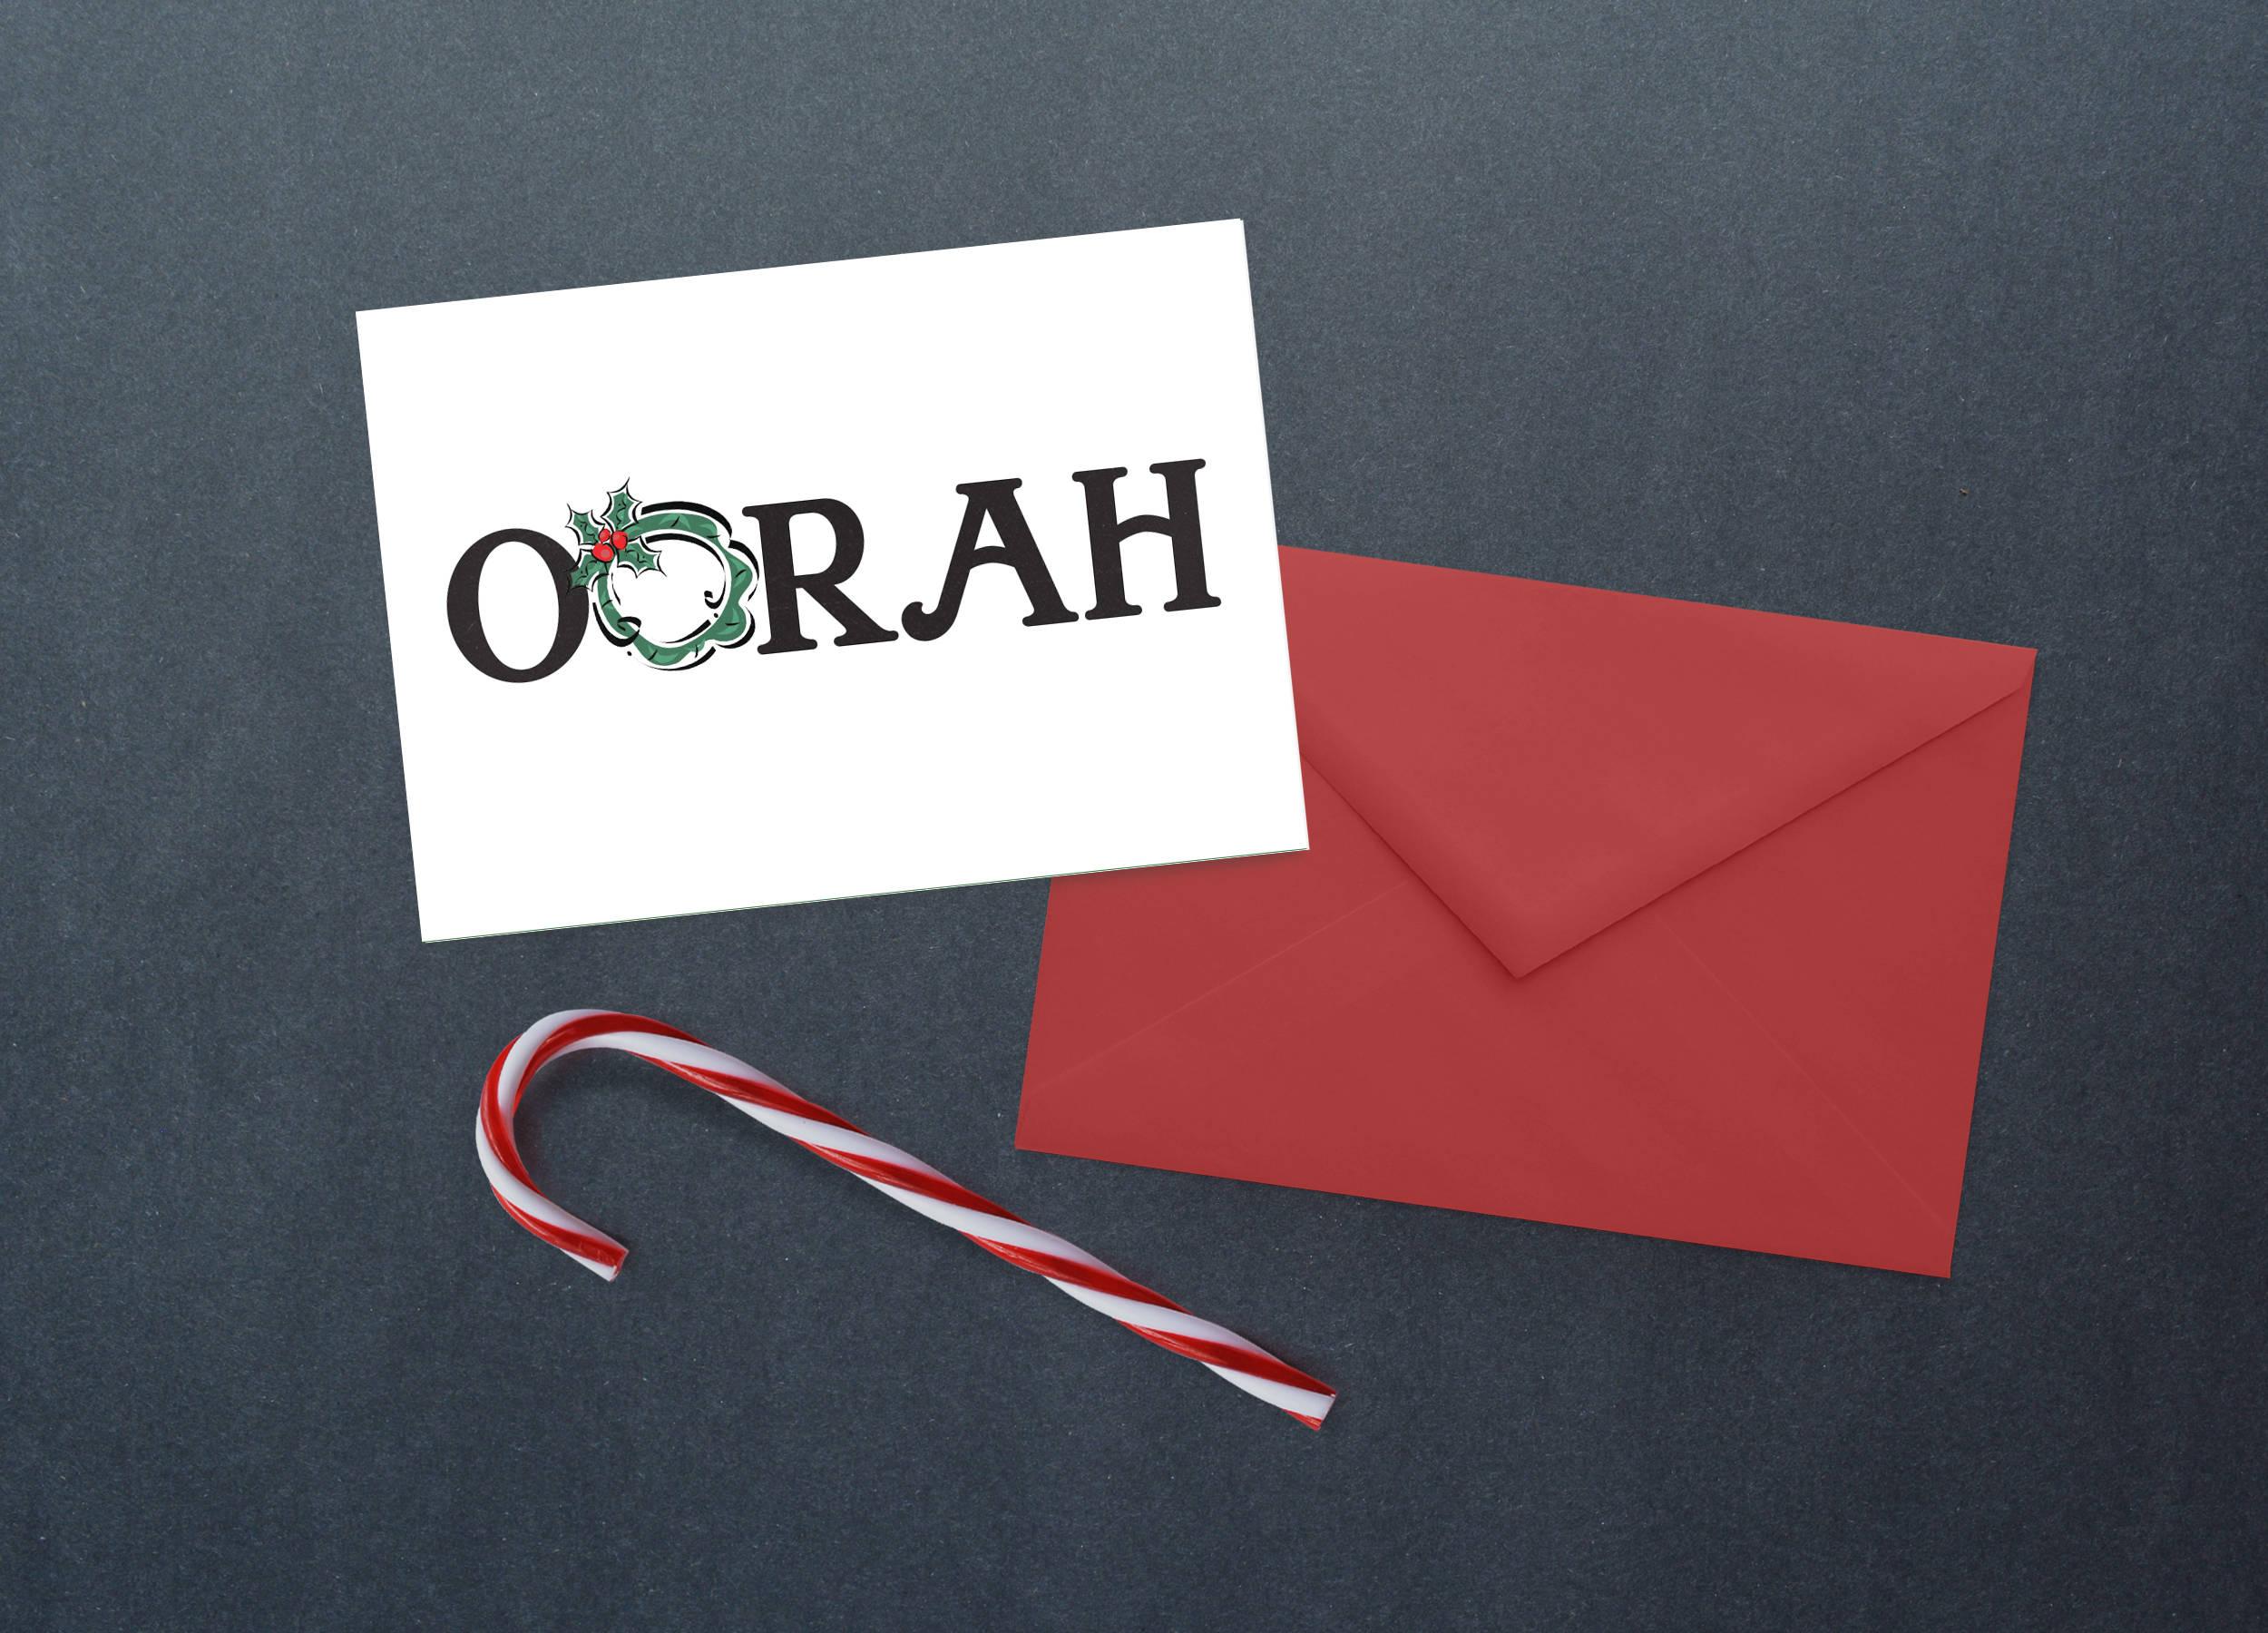 Oorah Holiday Cards Marines Christmas Cards Military Greeting